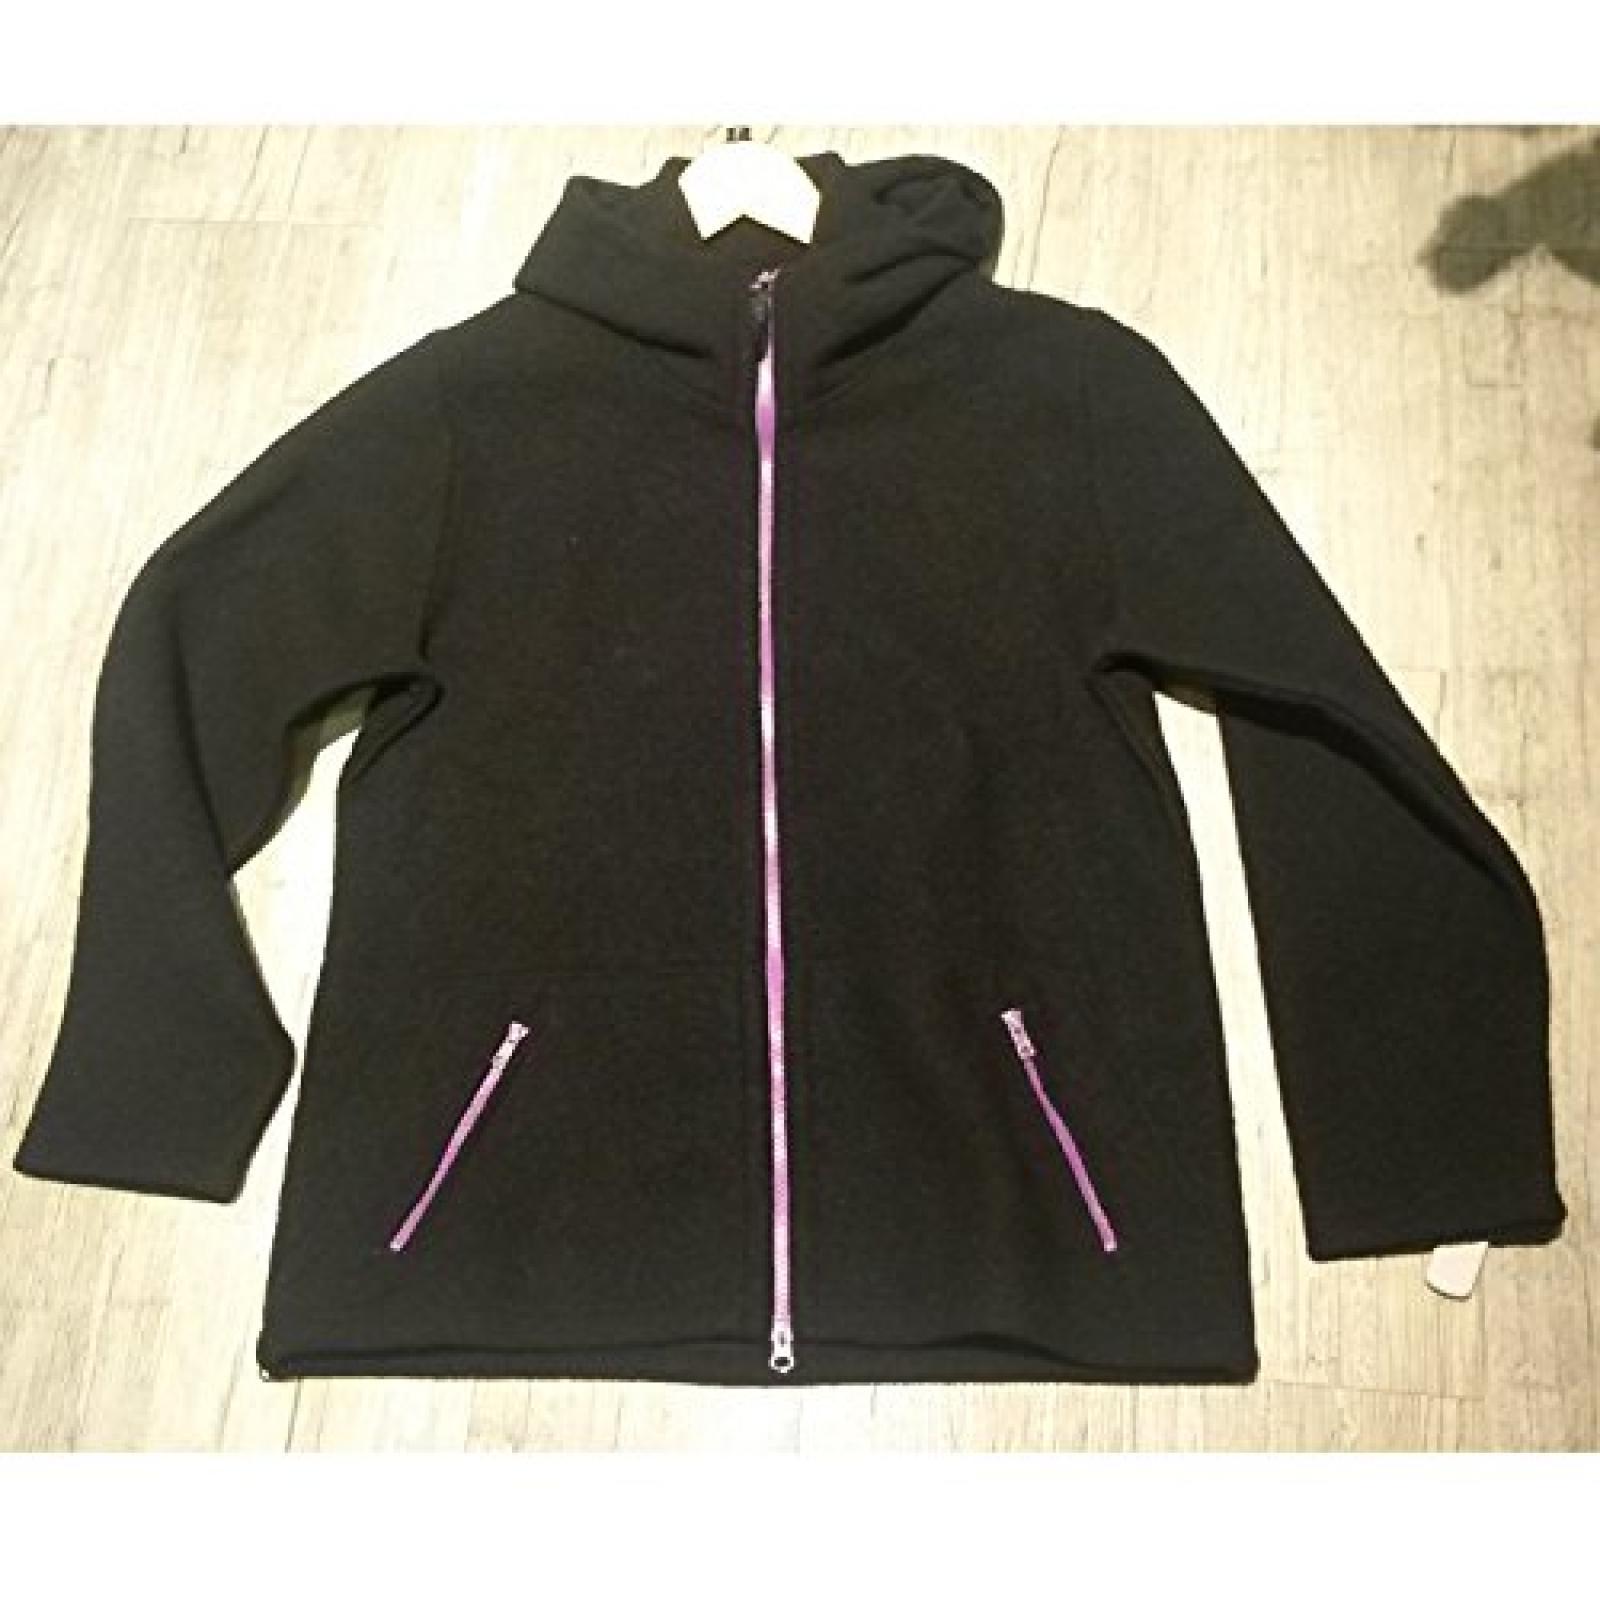 Mufflon Nele, Damen Wolljacke, schwarz mit pinkem RV